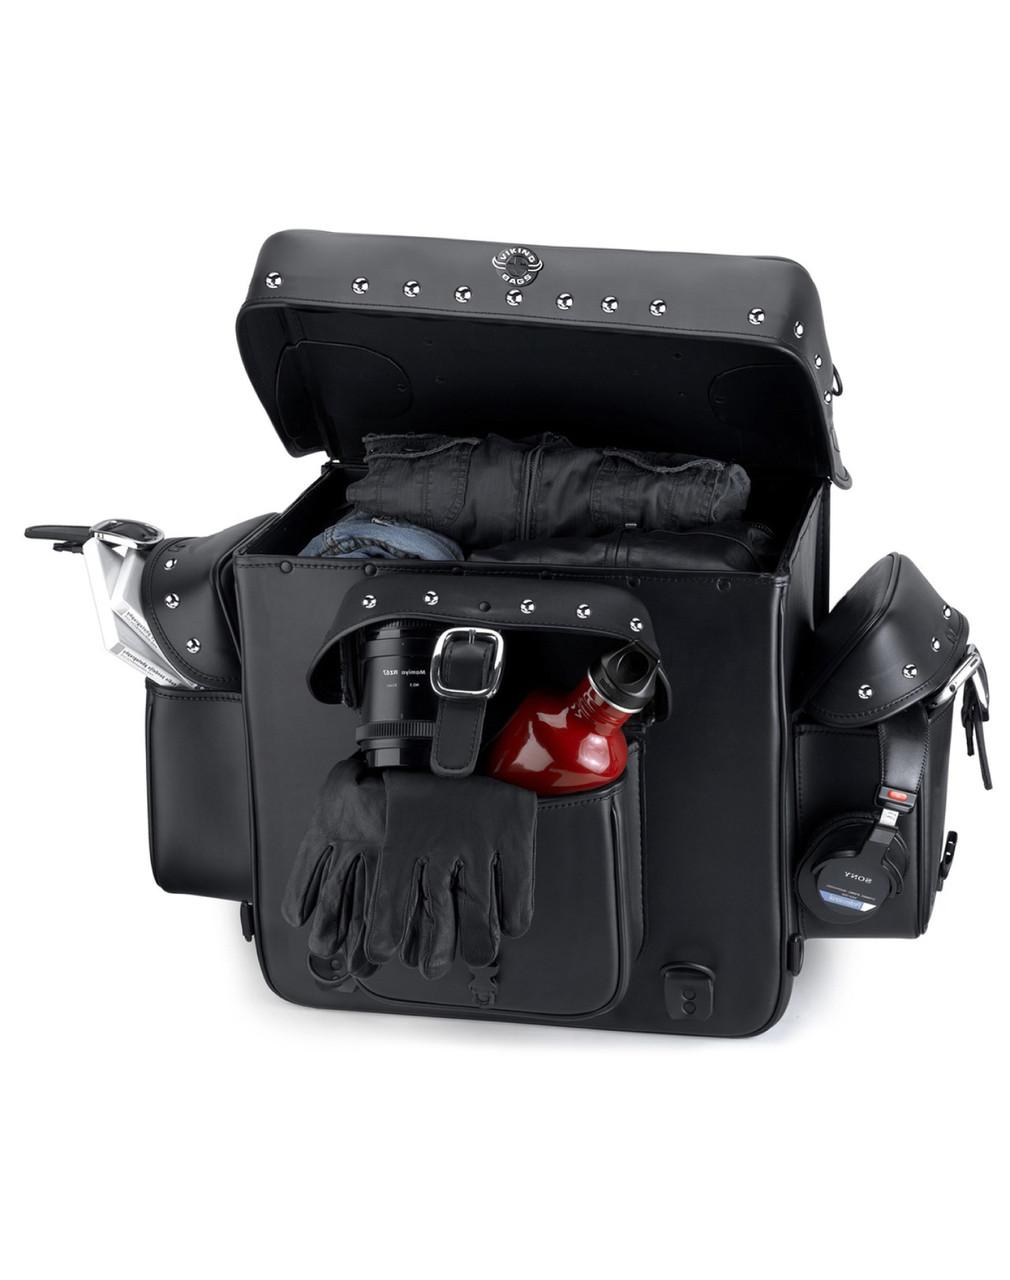 Honda Viking Revival Series Studded Motorcycle Sissy Bar Bag Storage View